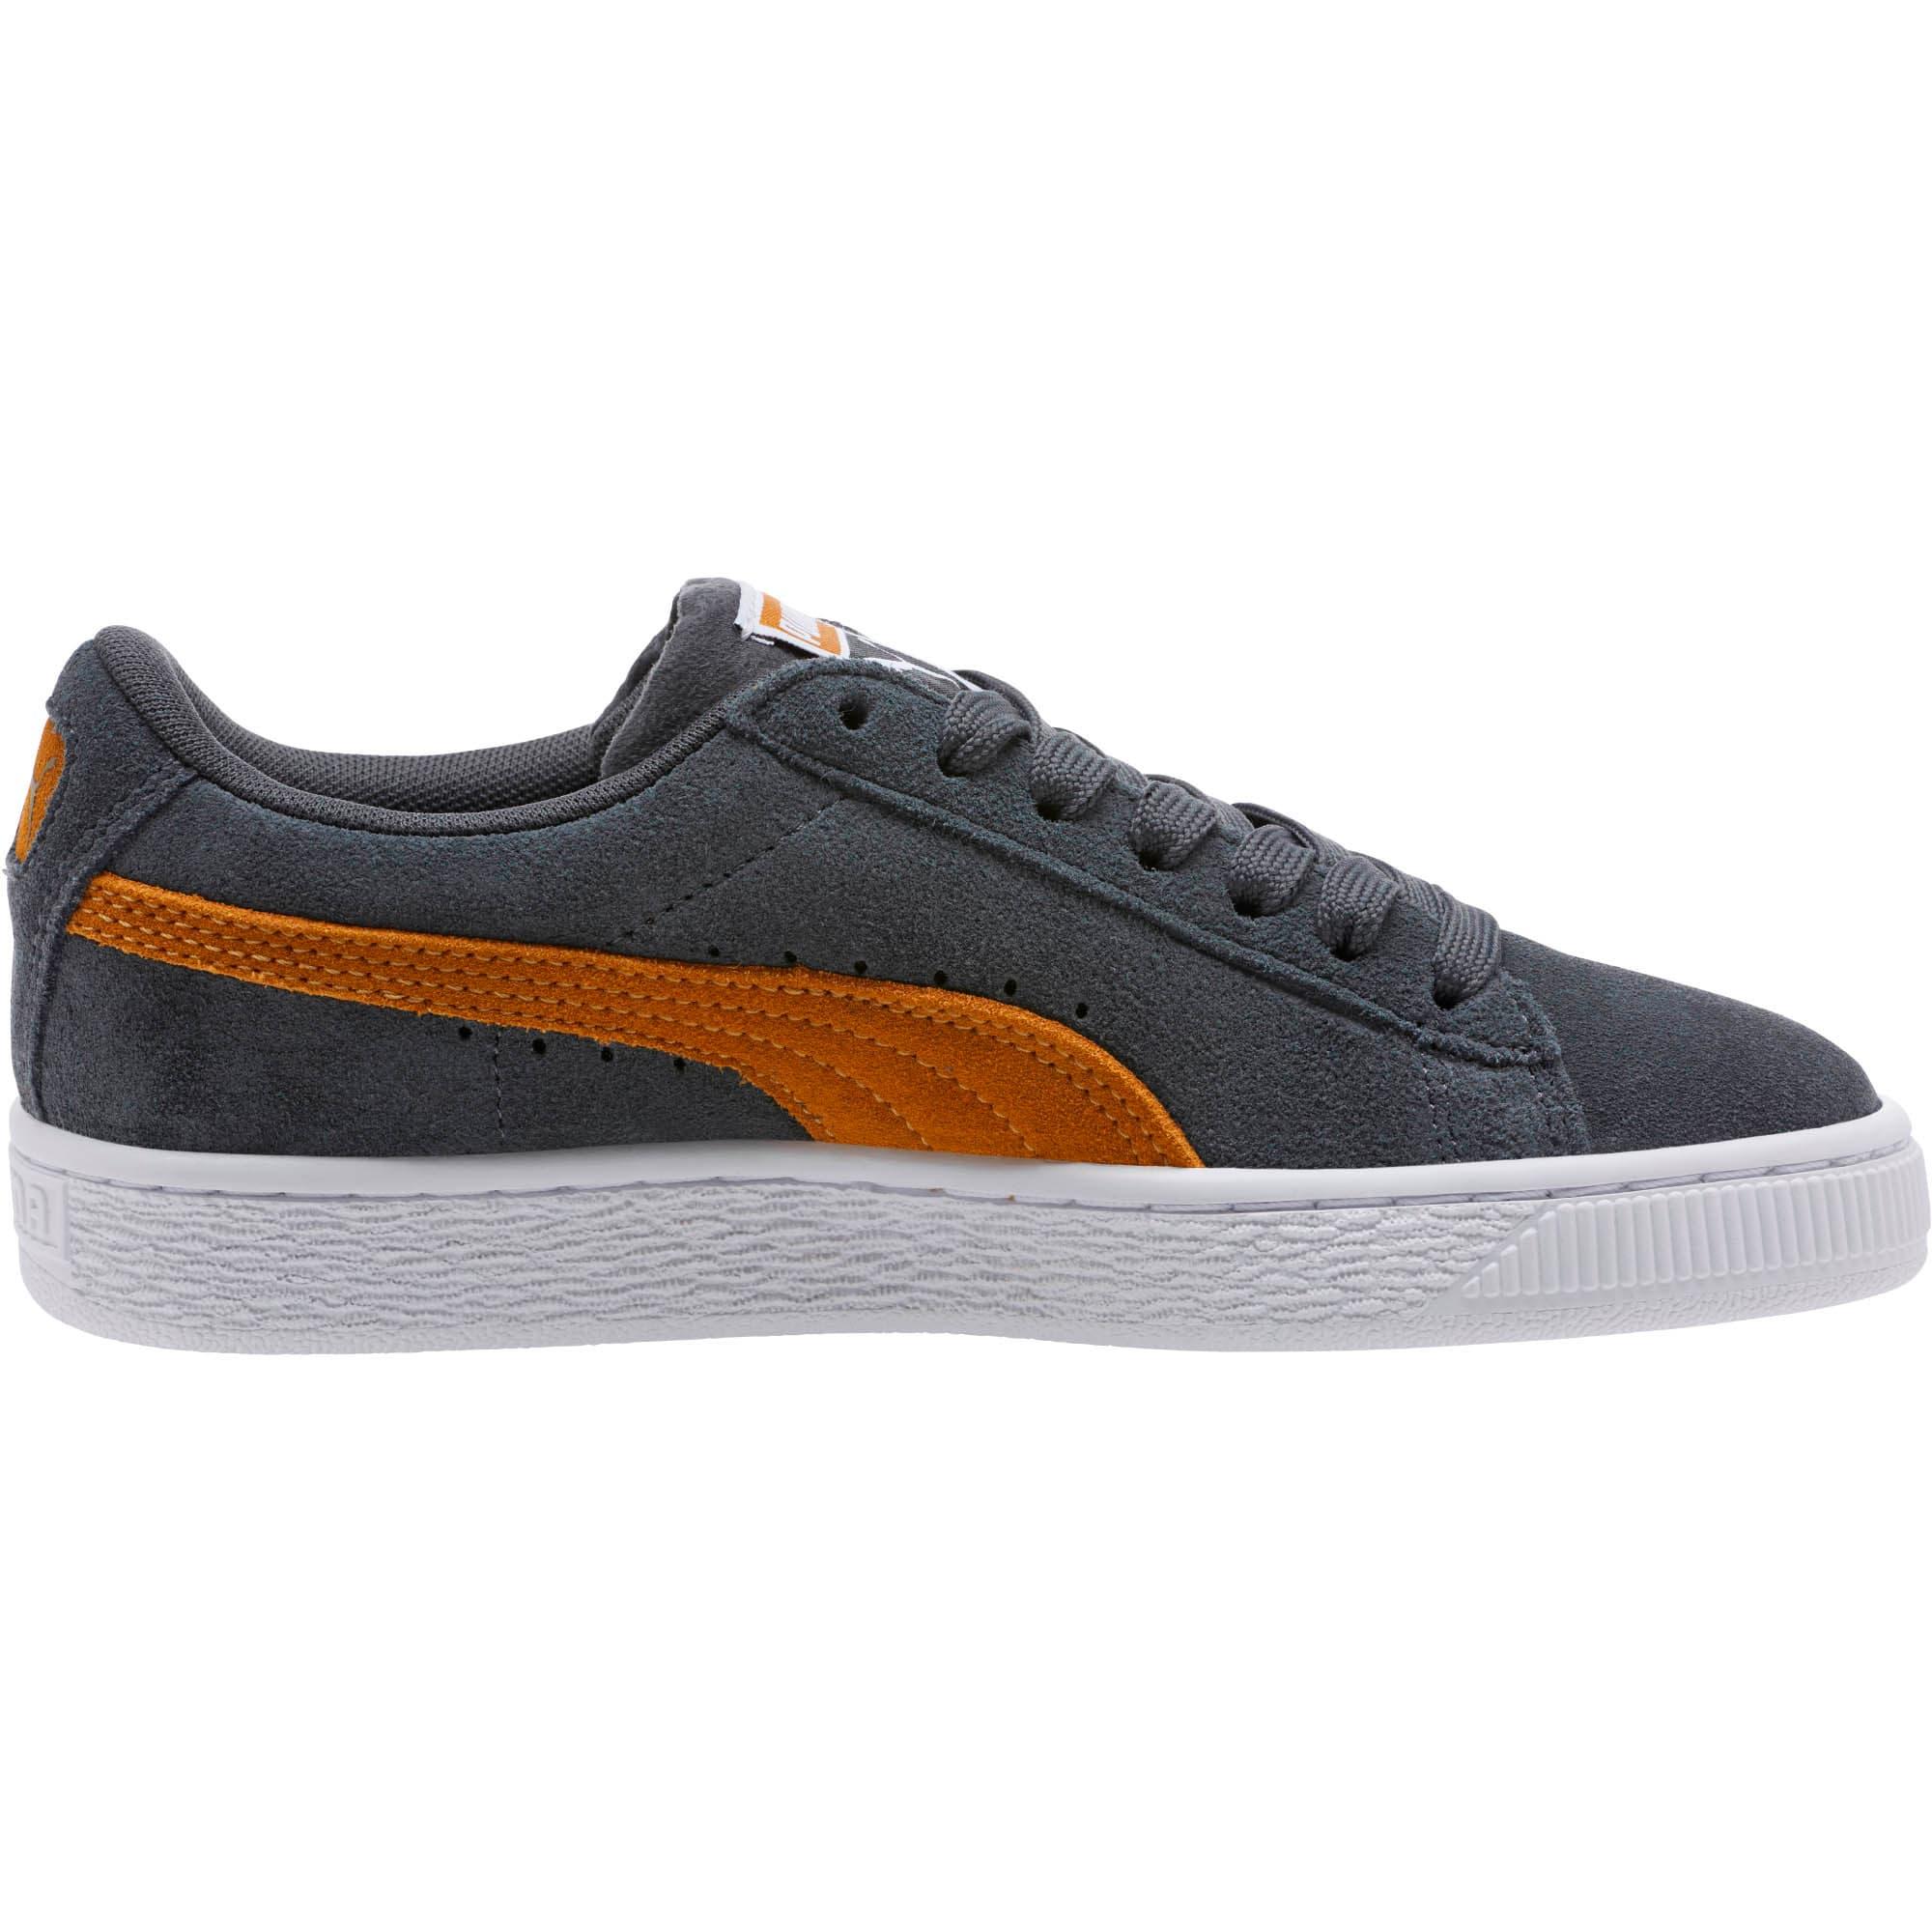 Thumbnail 3 of Suede Classic Sneakers JR, Iron Gate-Buckthorn, medium